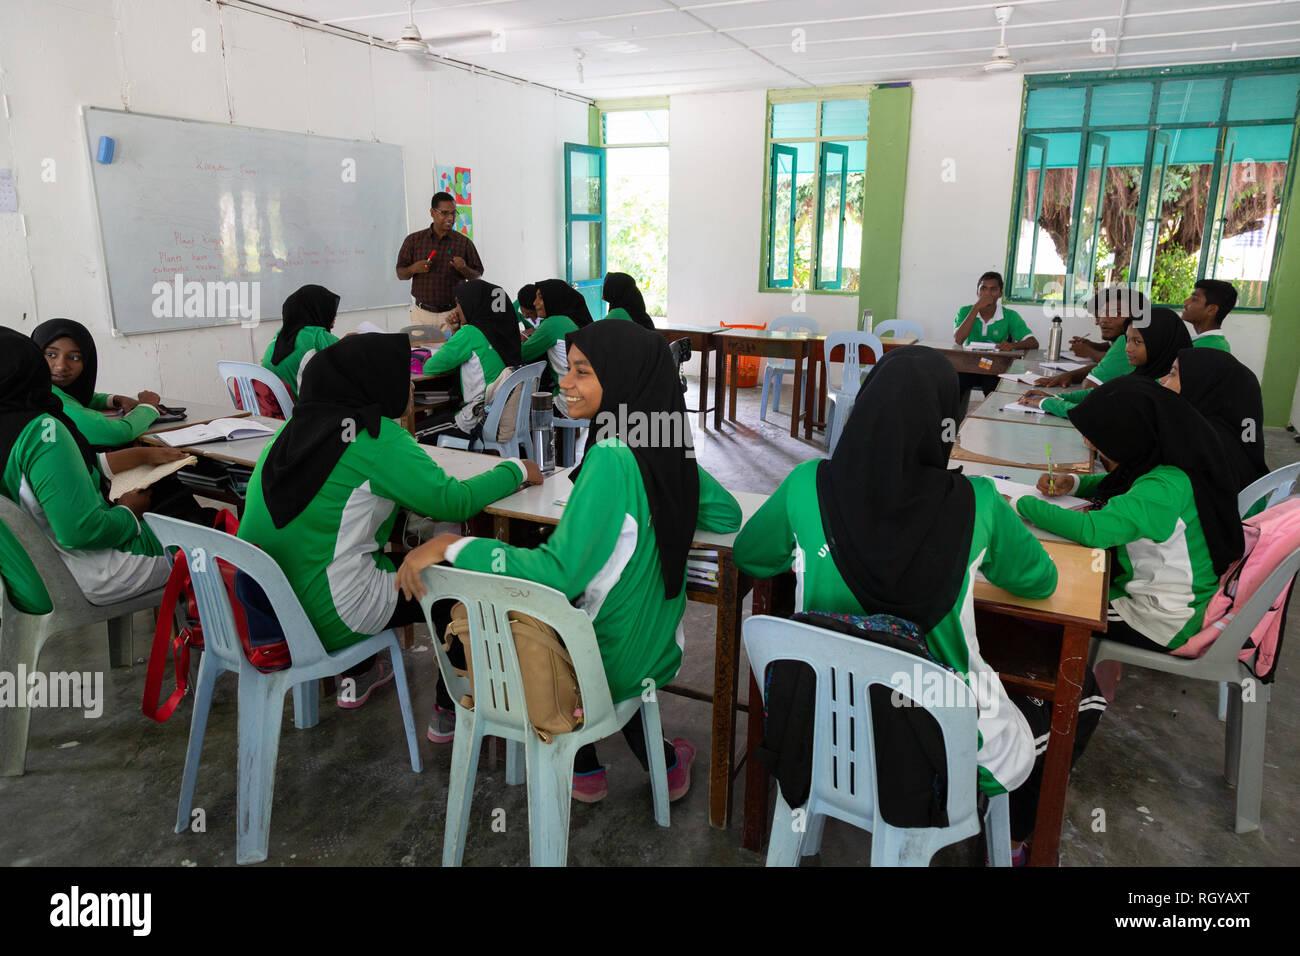 Asia school - muslim secondary schoolchildren in the classroom, Ukulhas Island, the Maldives, Asia - Stock Image